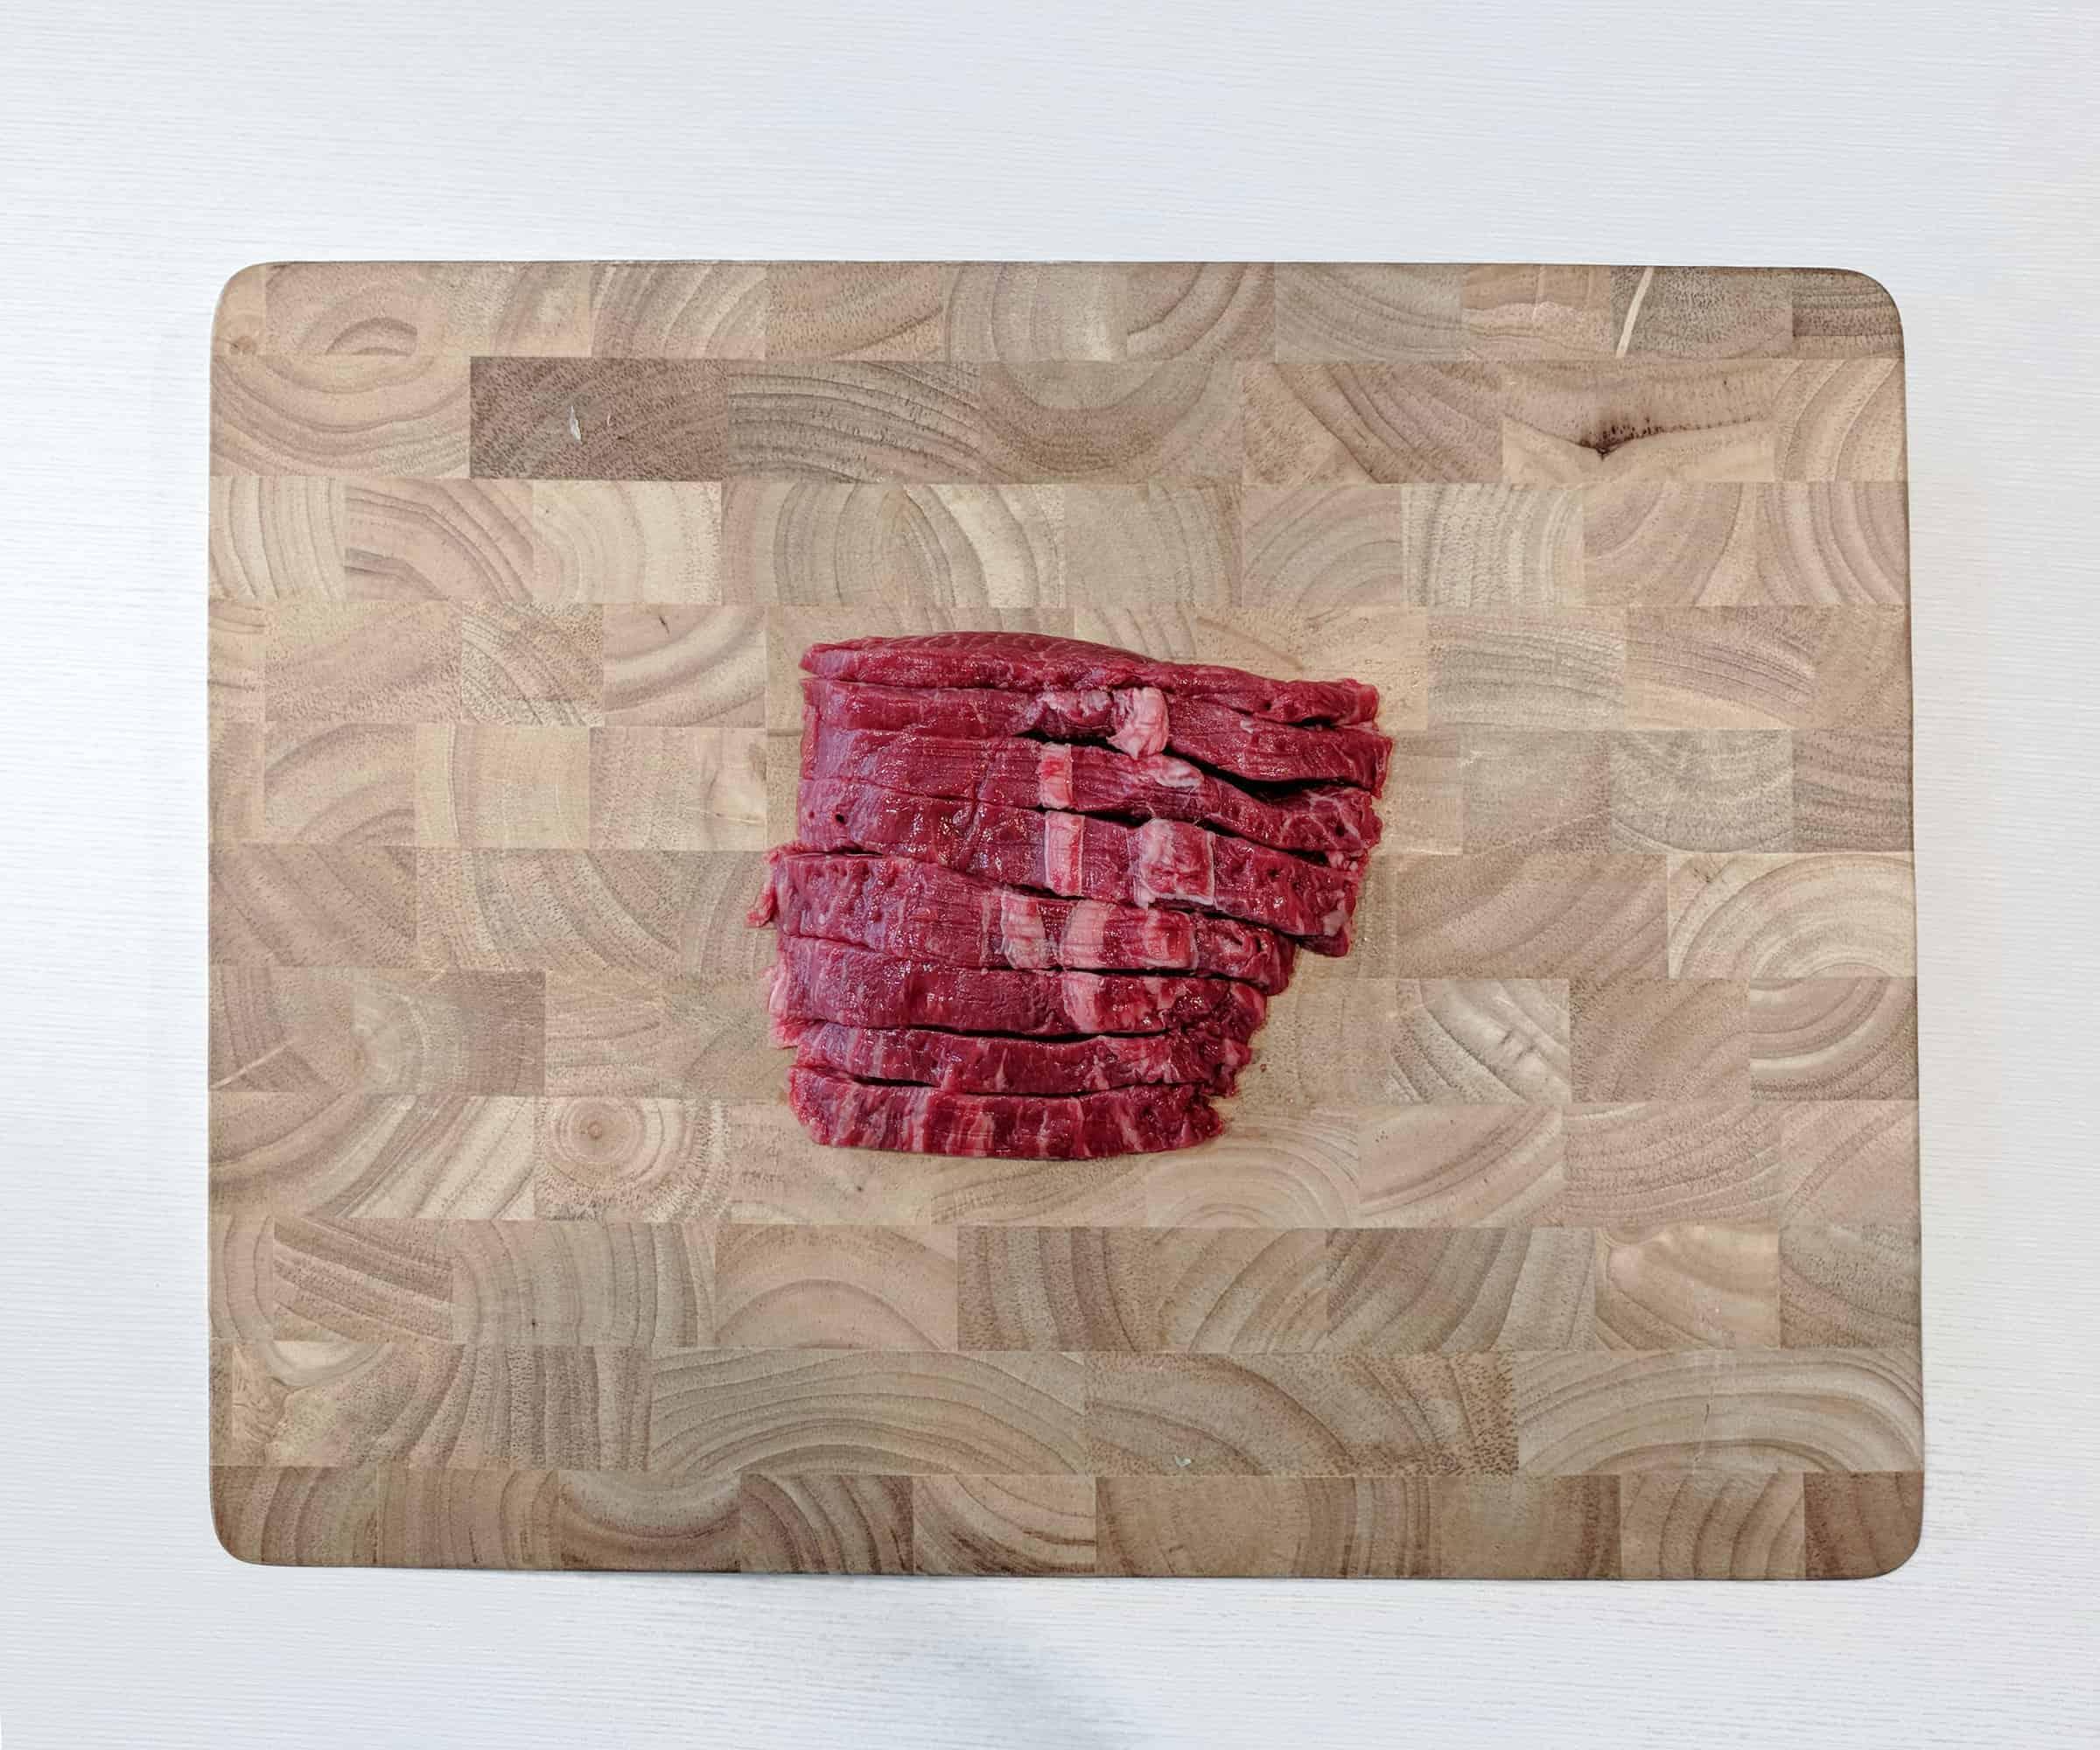 Pho Flat Iron Steak